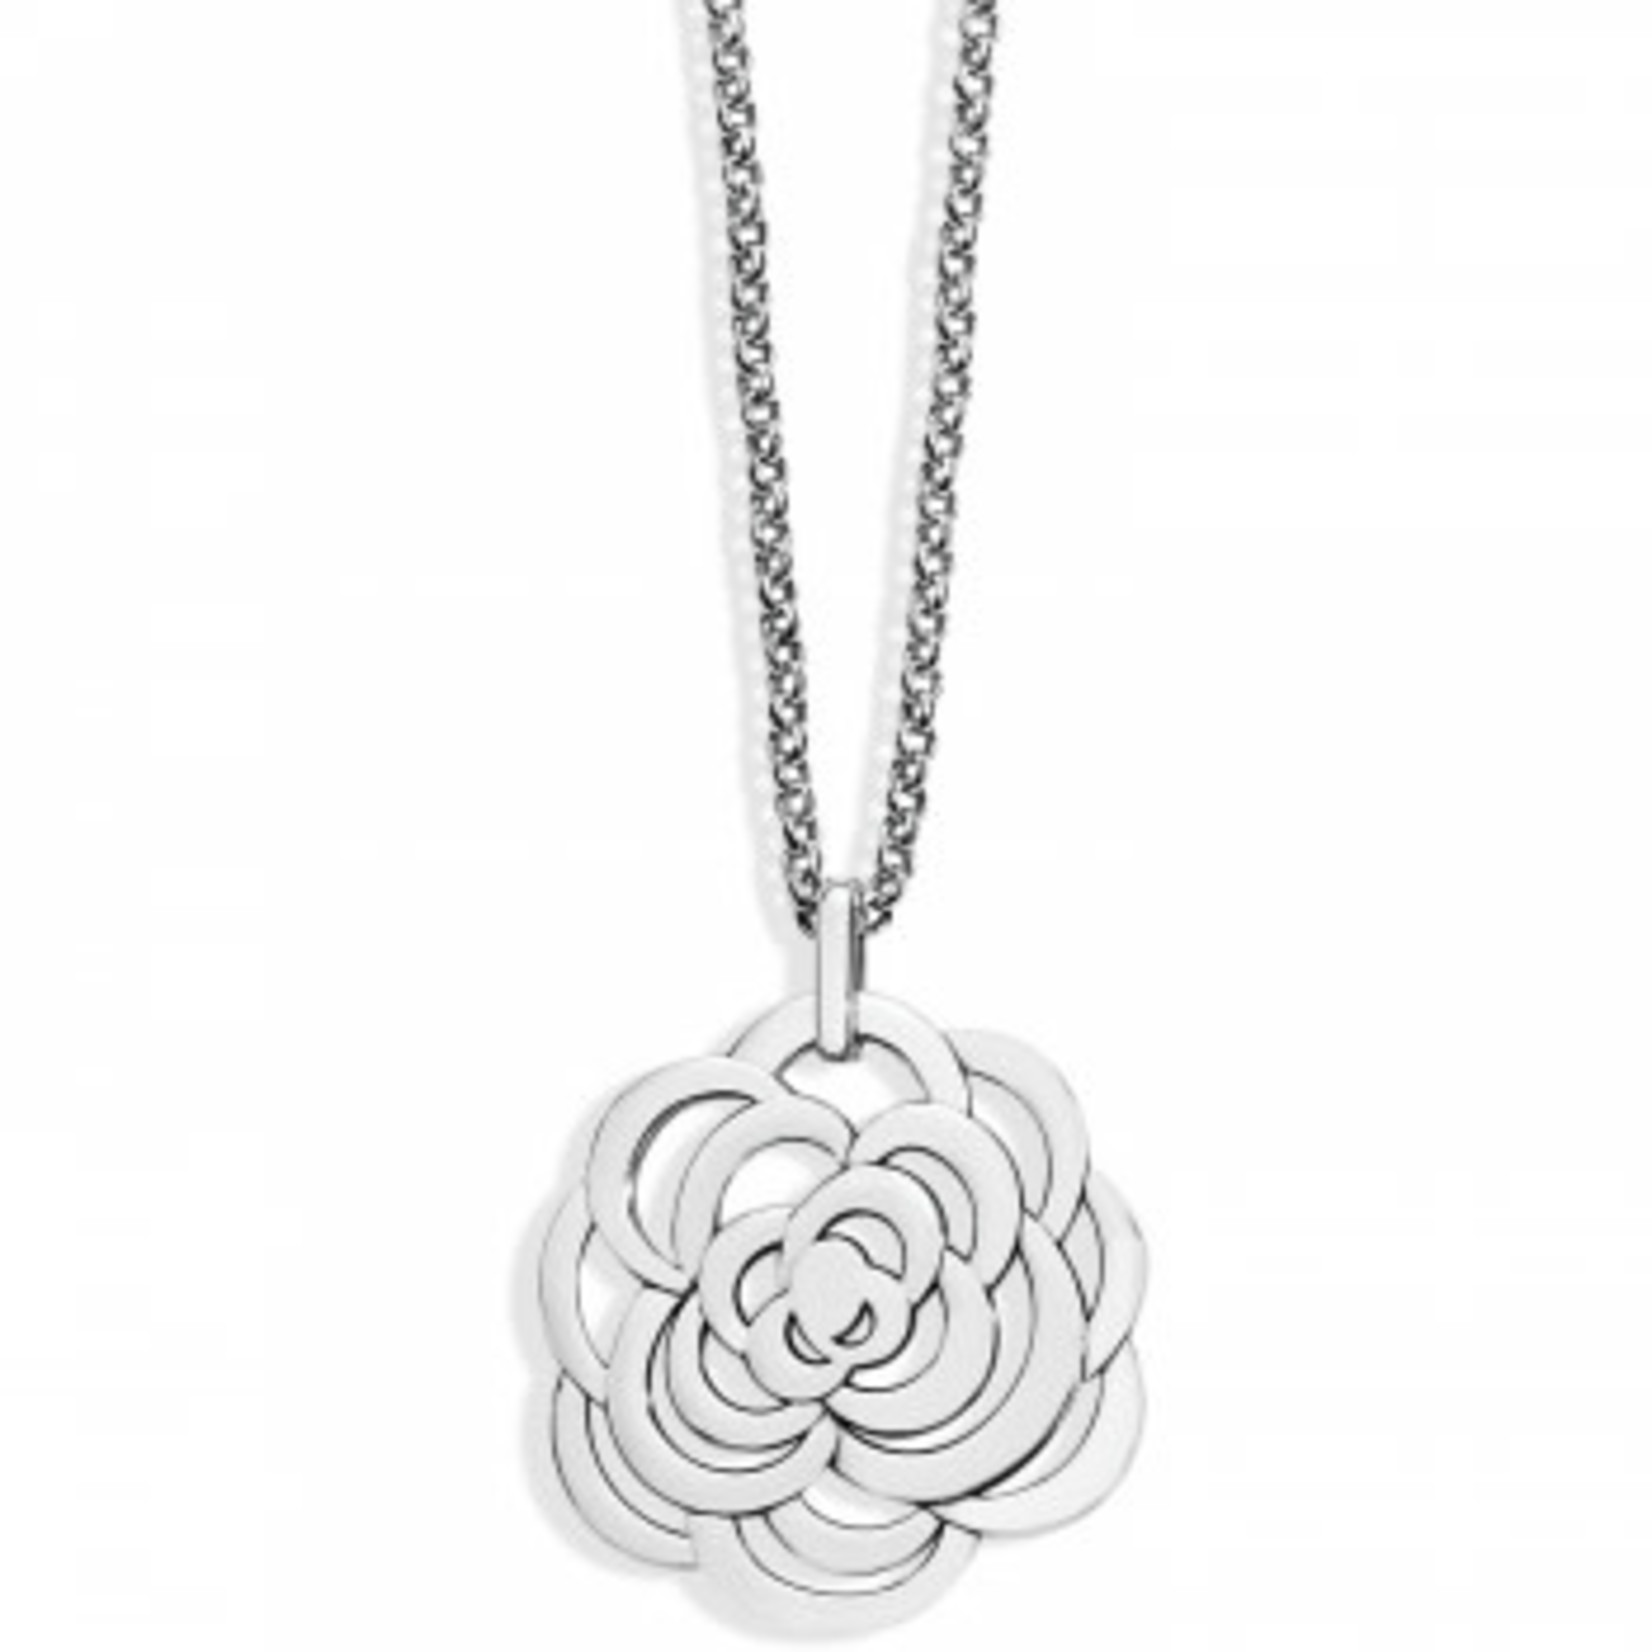 Brighton The Botanical Rose Convertible Necklace Silver